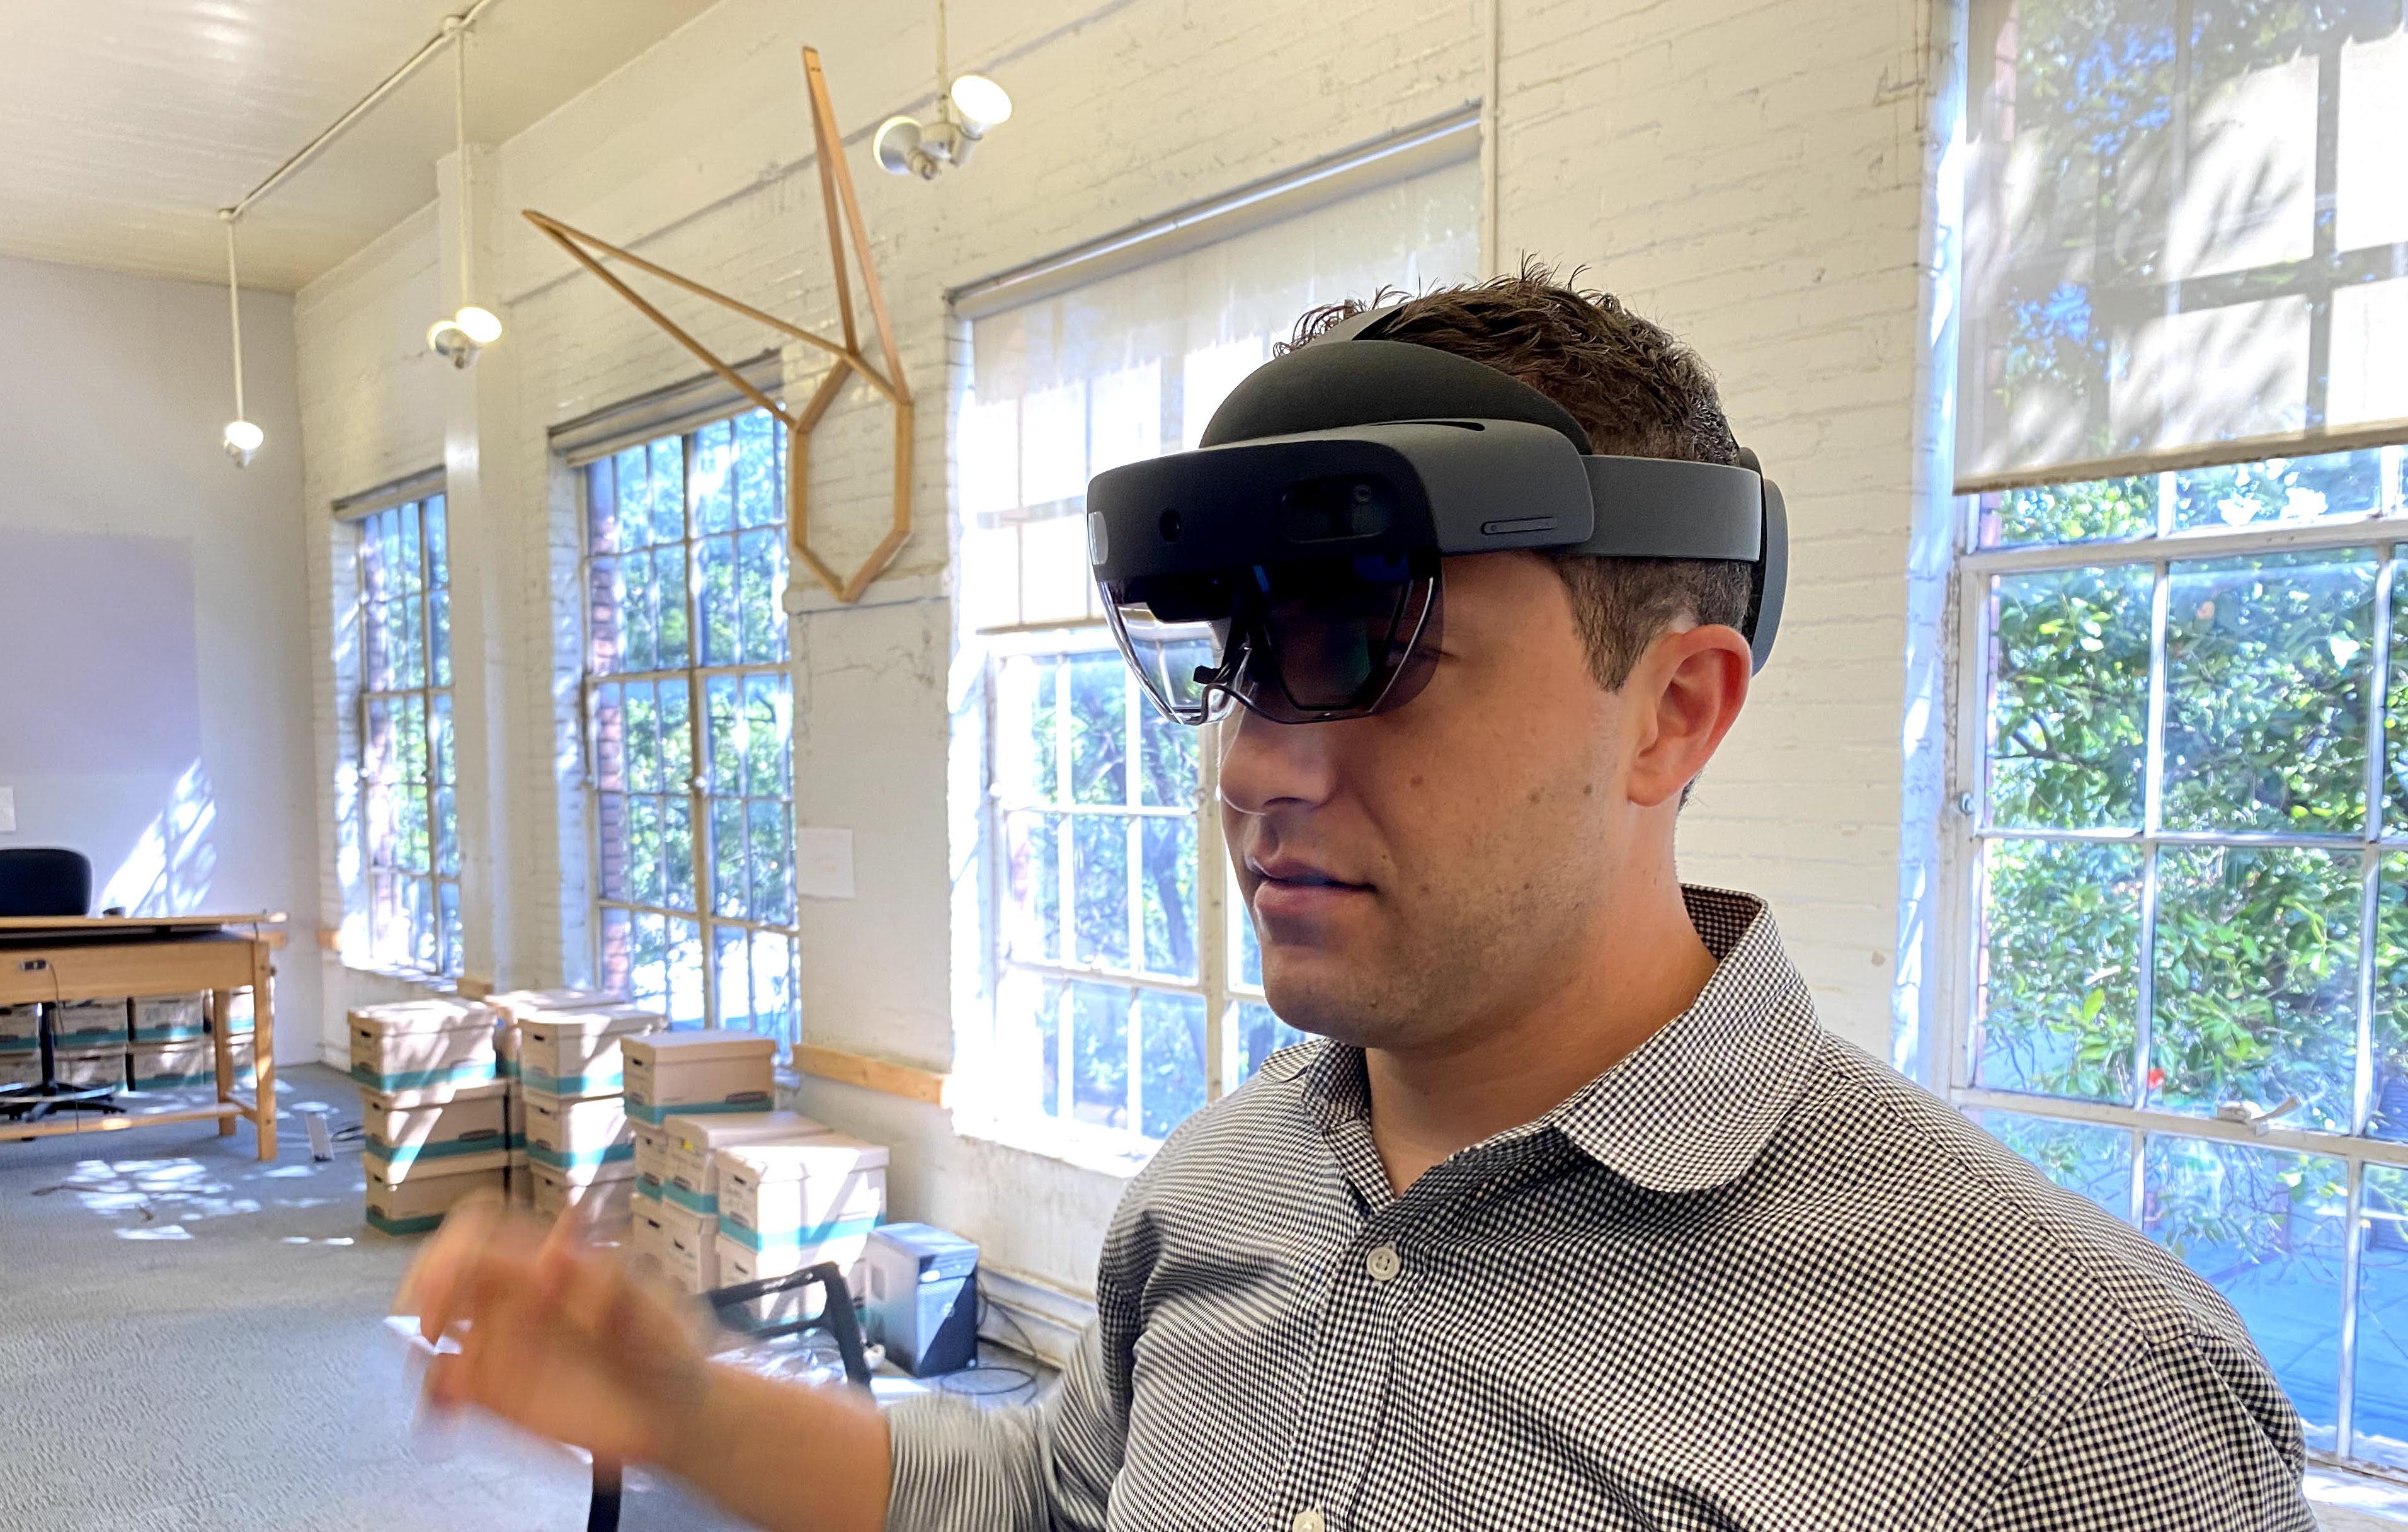 Evan Morris using Microsoft HoloLens 2